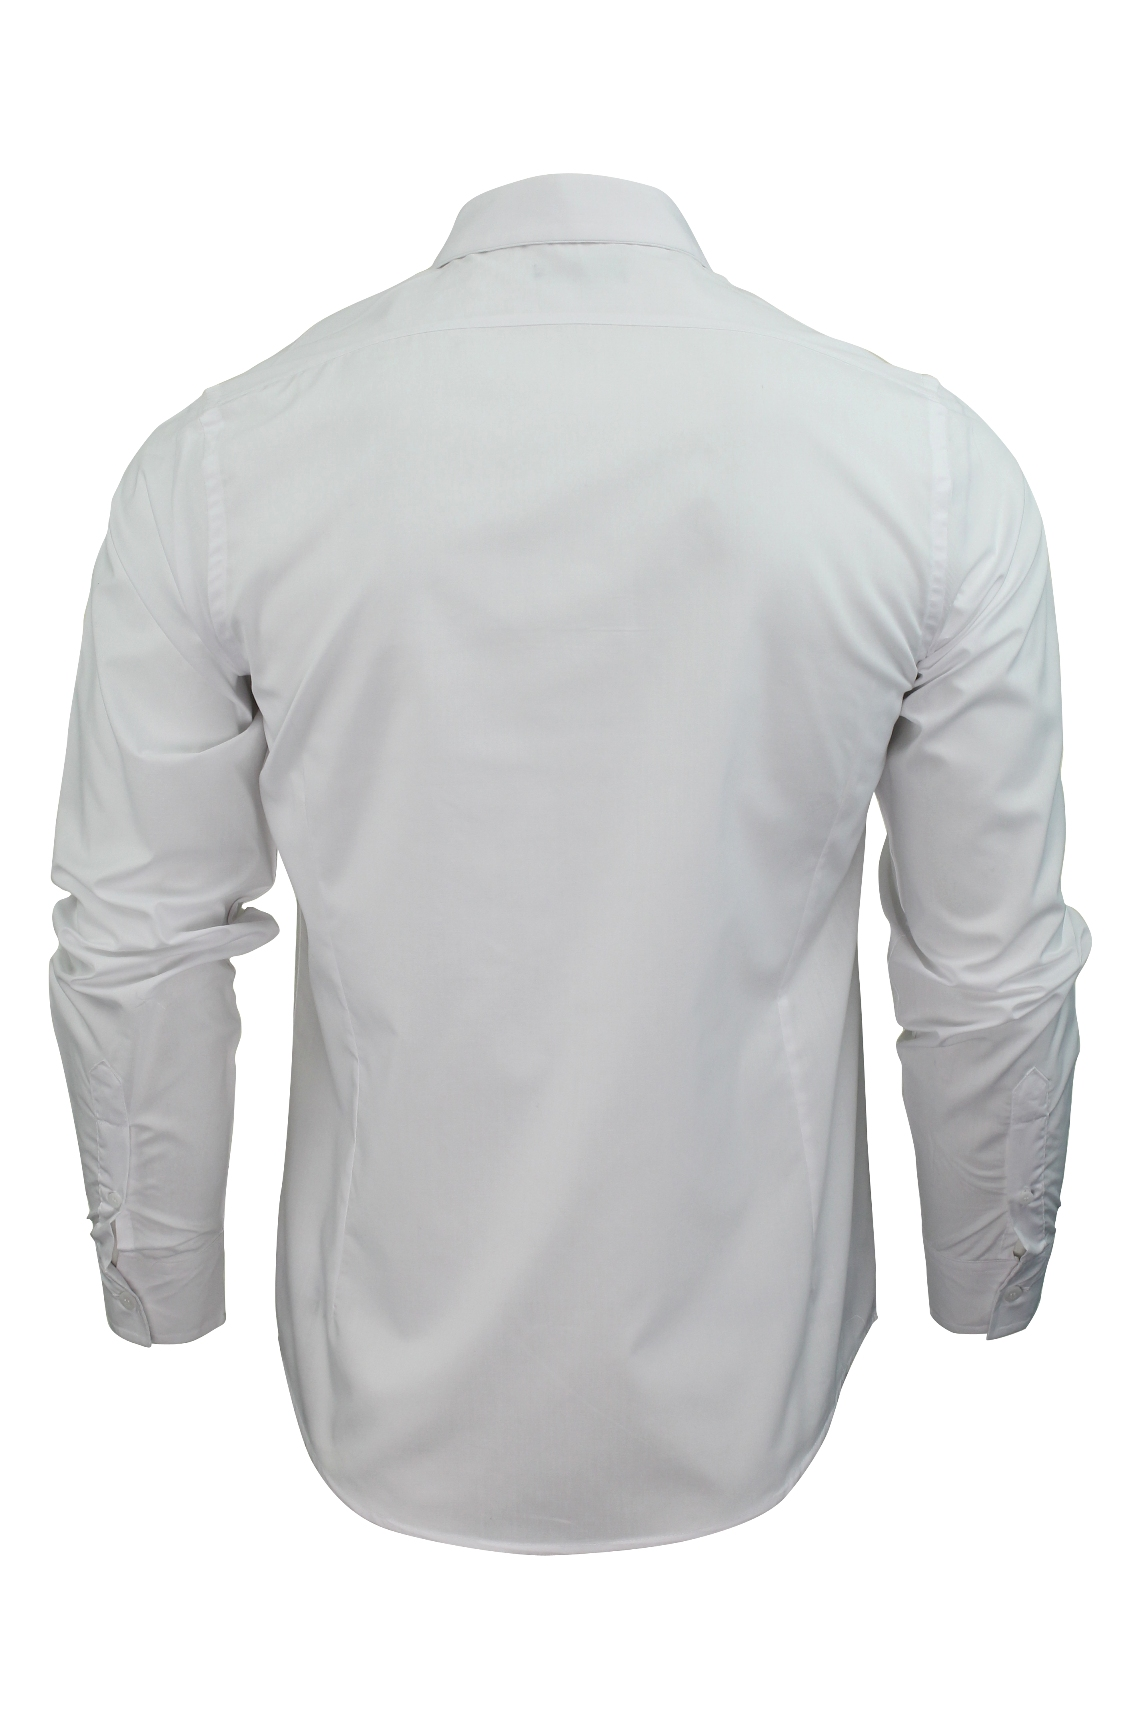 Mens-Plain-Shirt-by-Brave-Soul-039-Tudor-039-Long-Sleeved thumbnail 14